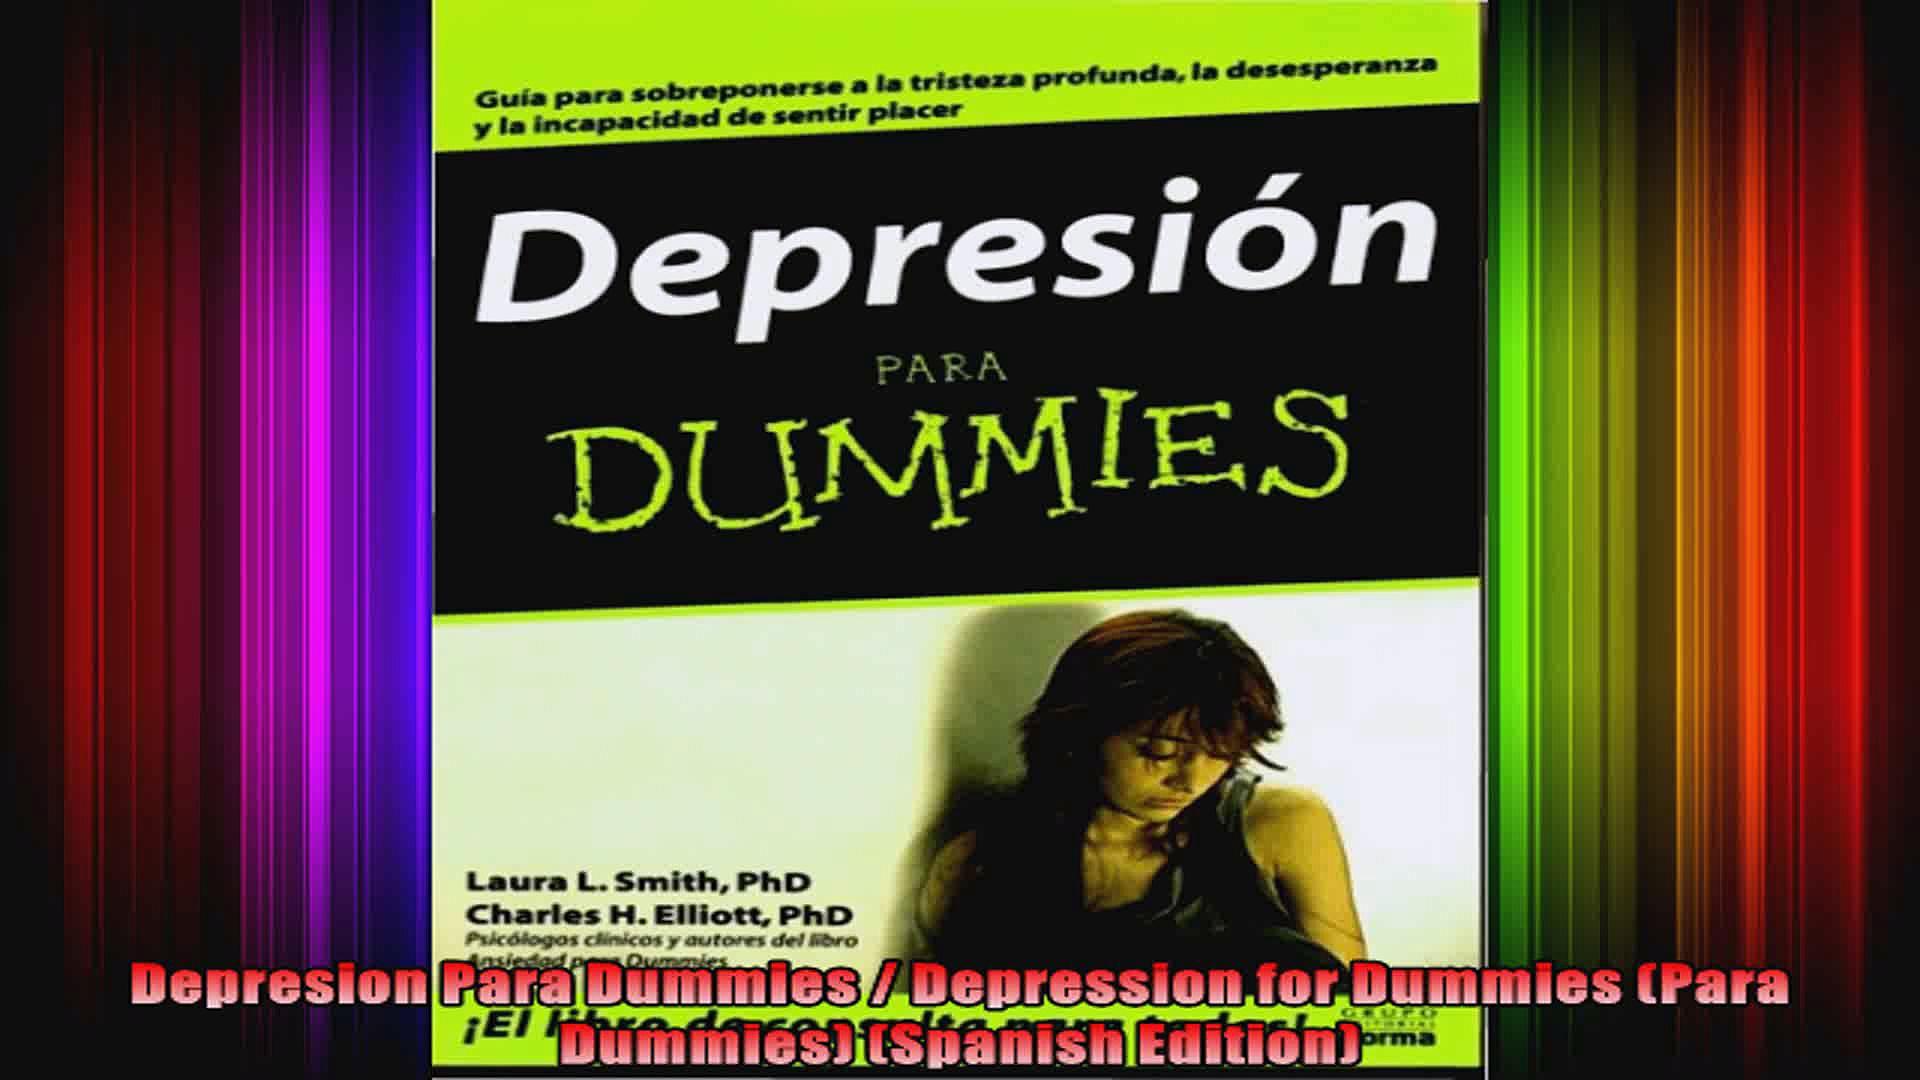 Depresion Para Dummies  Depression for Dummies Para Dummies Spanish Edition